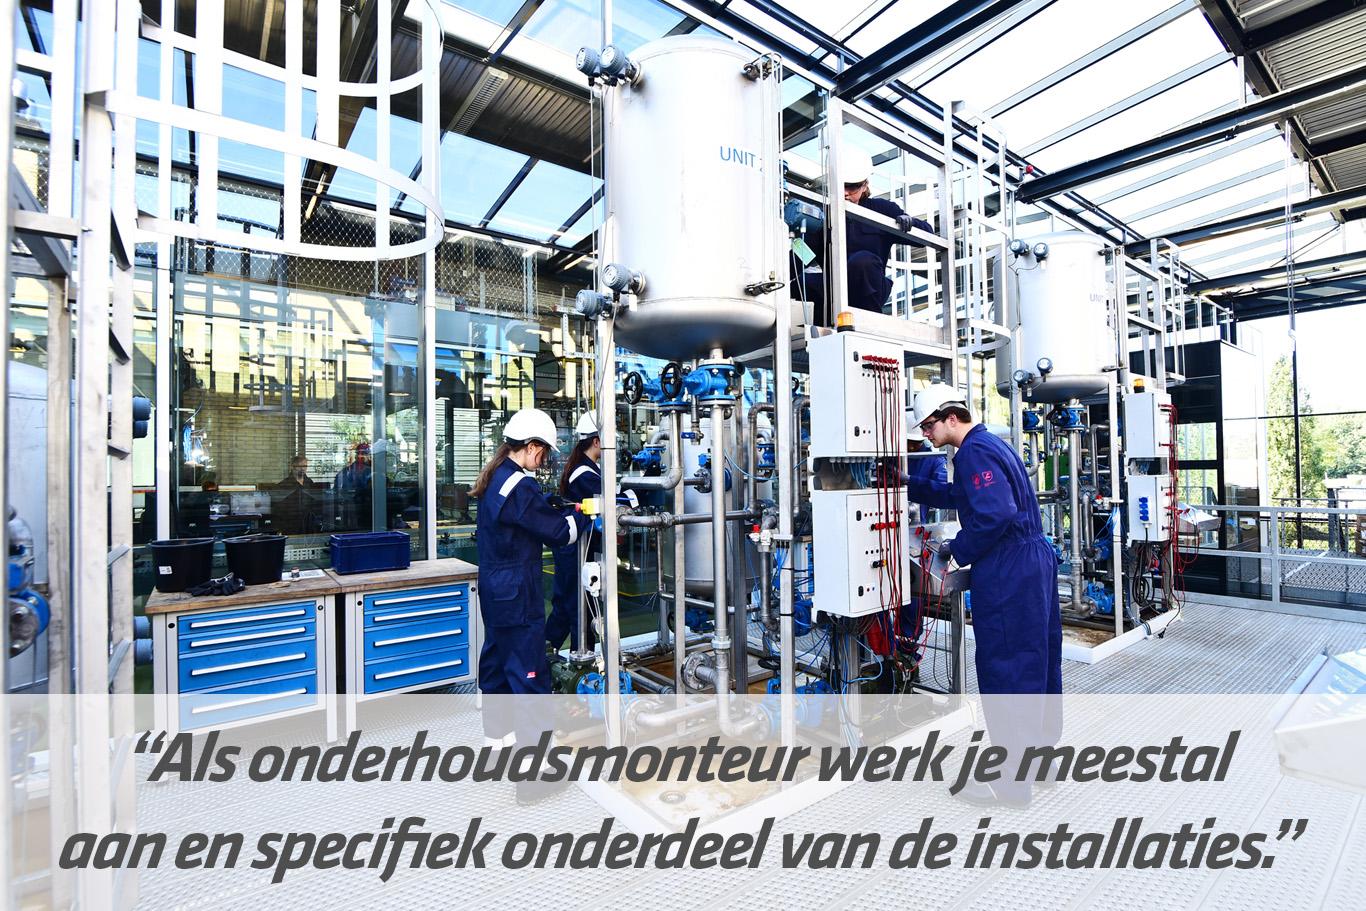 mbo-opleiding Medewerker operationele techniek - maintenance | STC mbo college Rotterdam